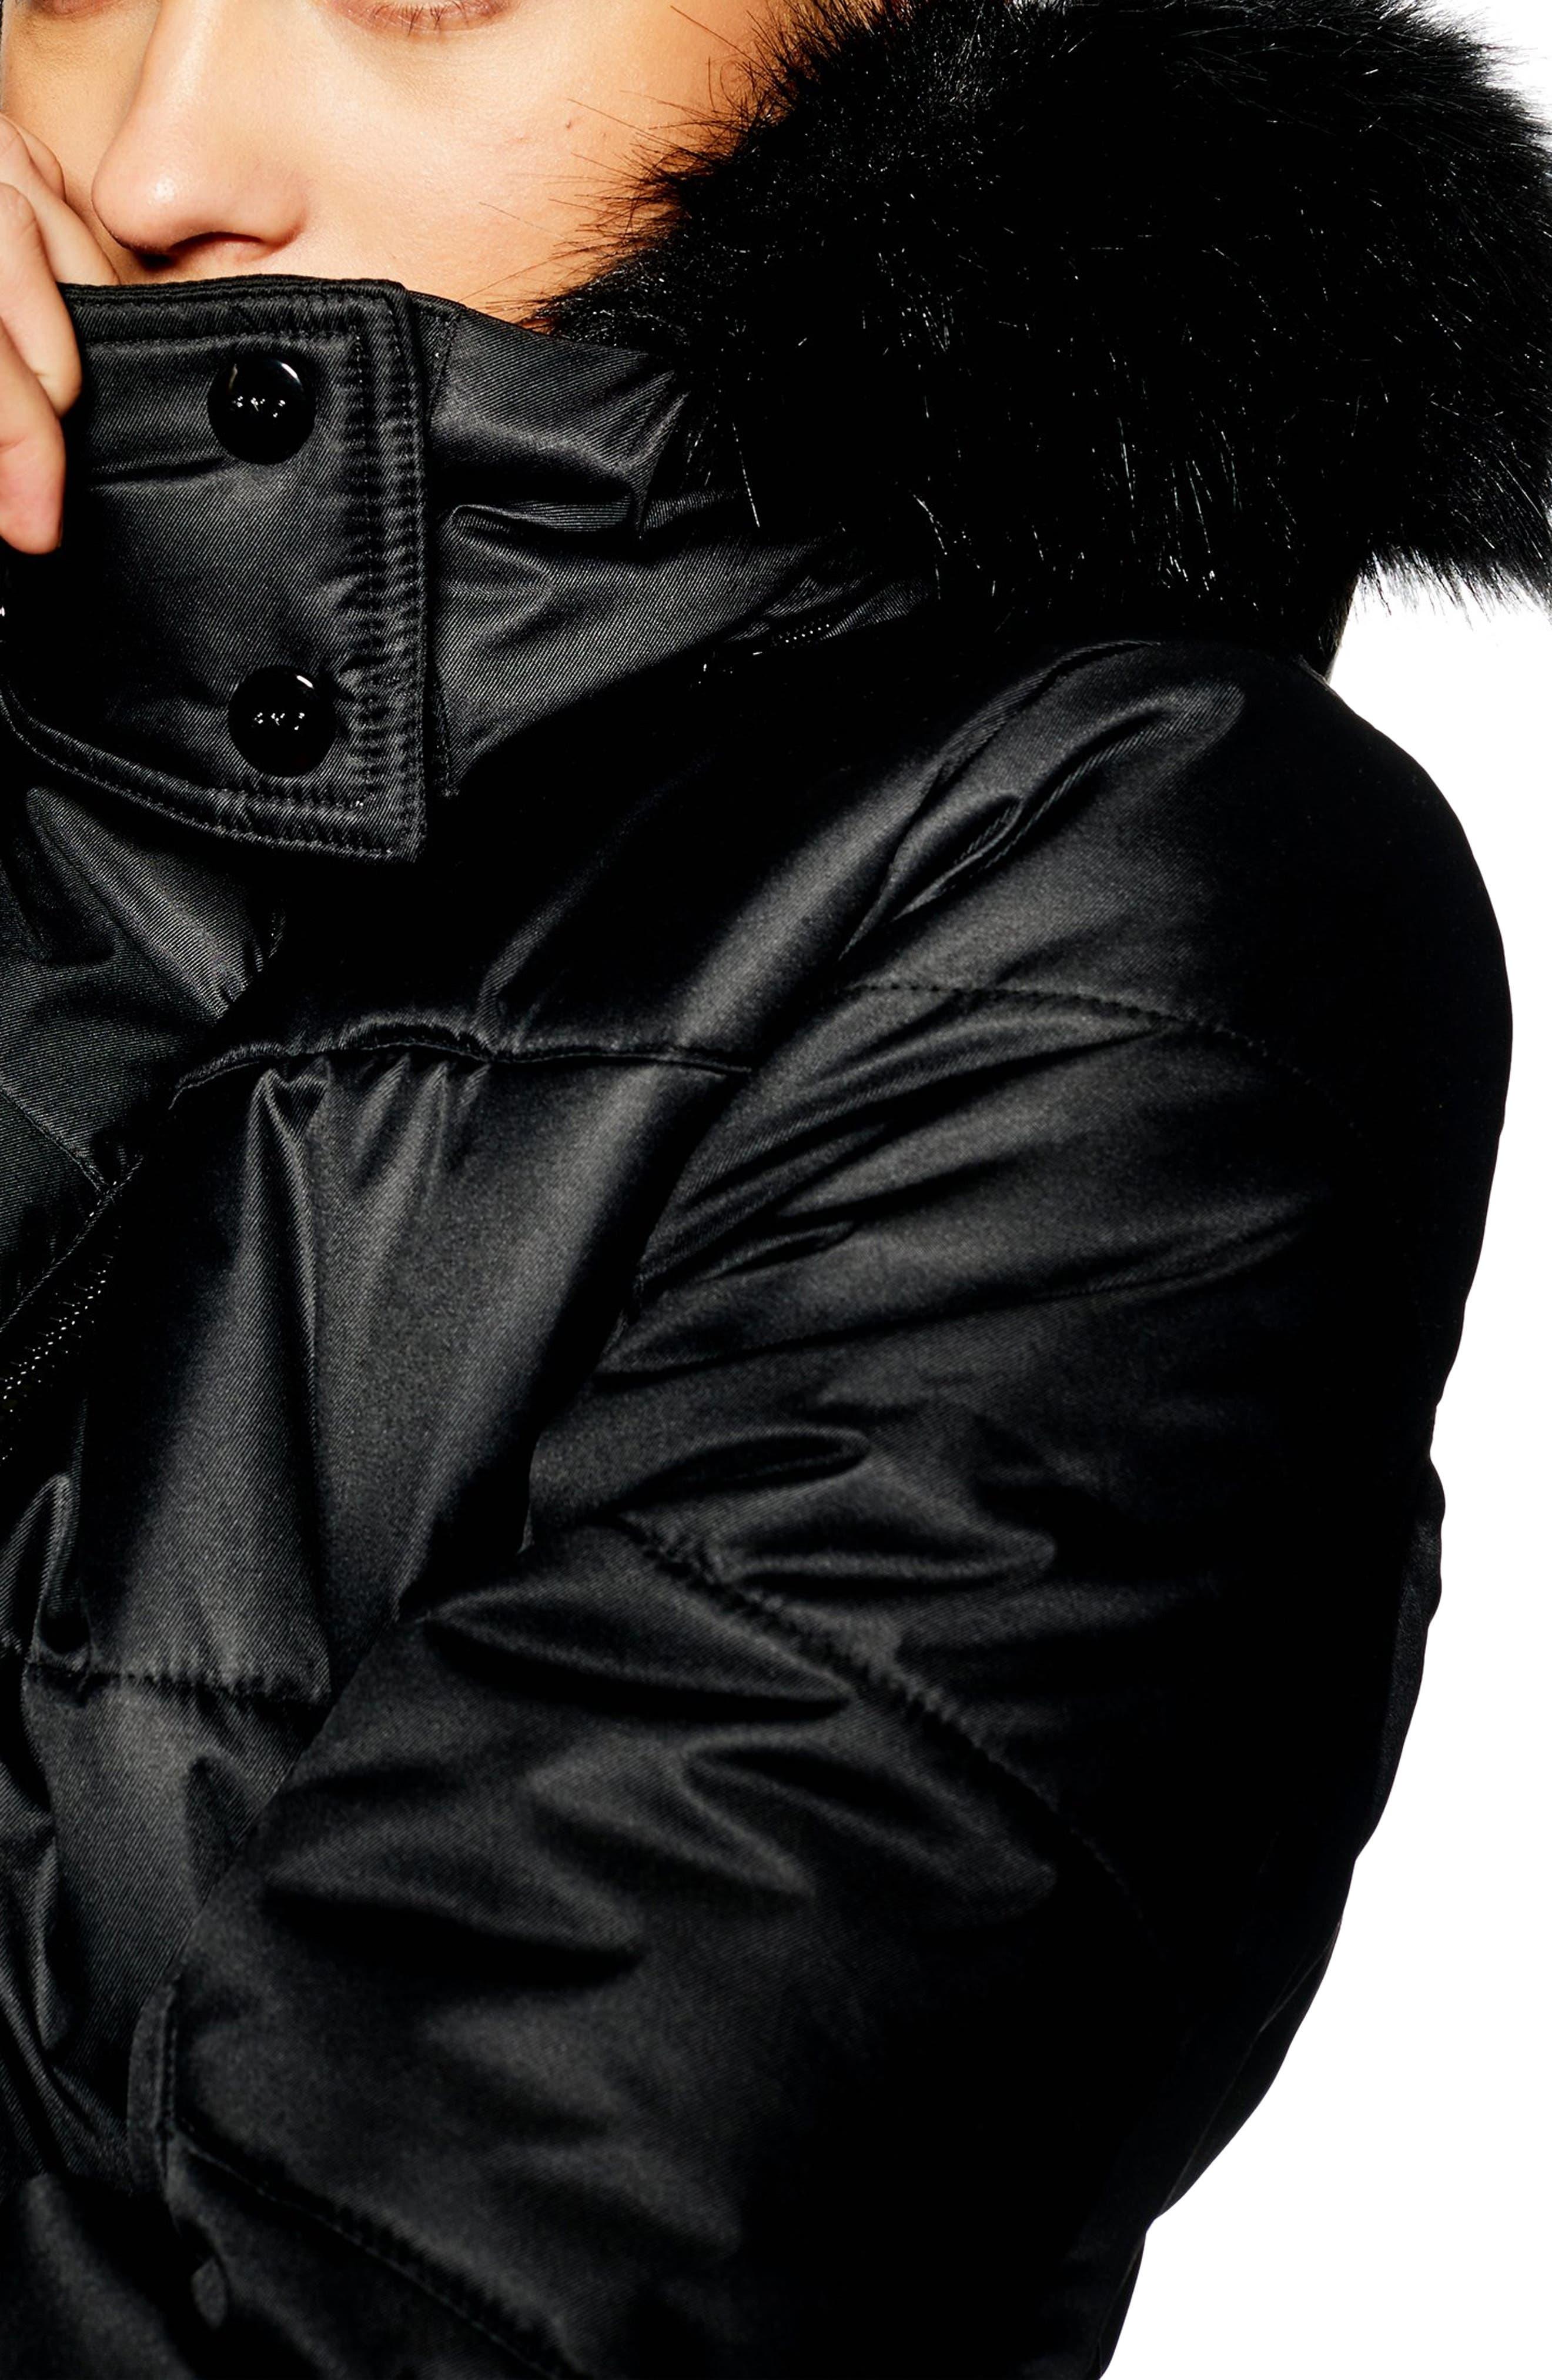 Sno Baby Ski Jacket,                             Alternate thumbnail 3, color,                             BLACK